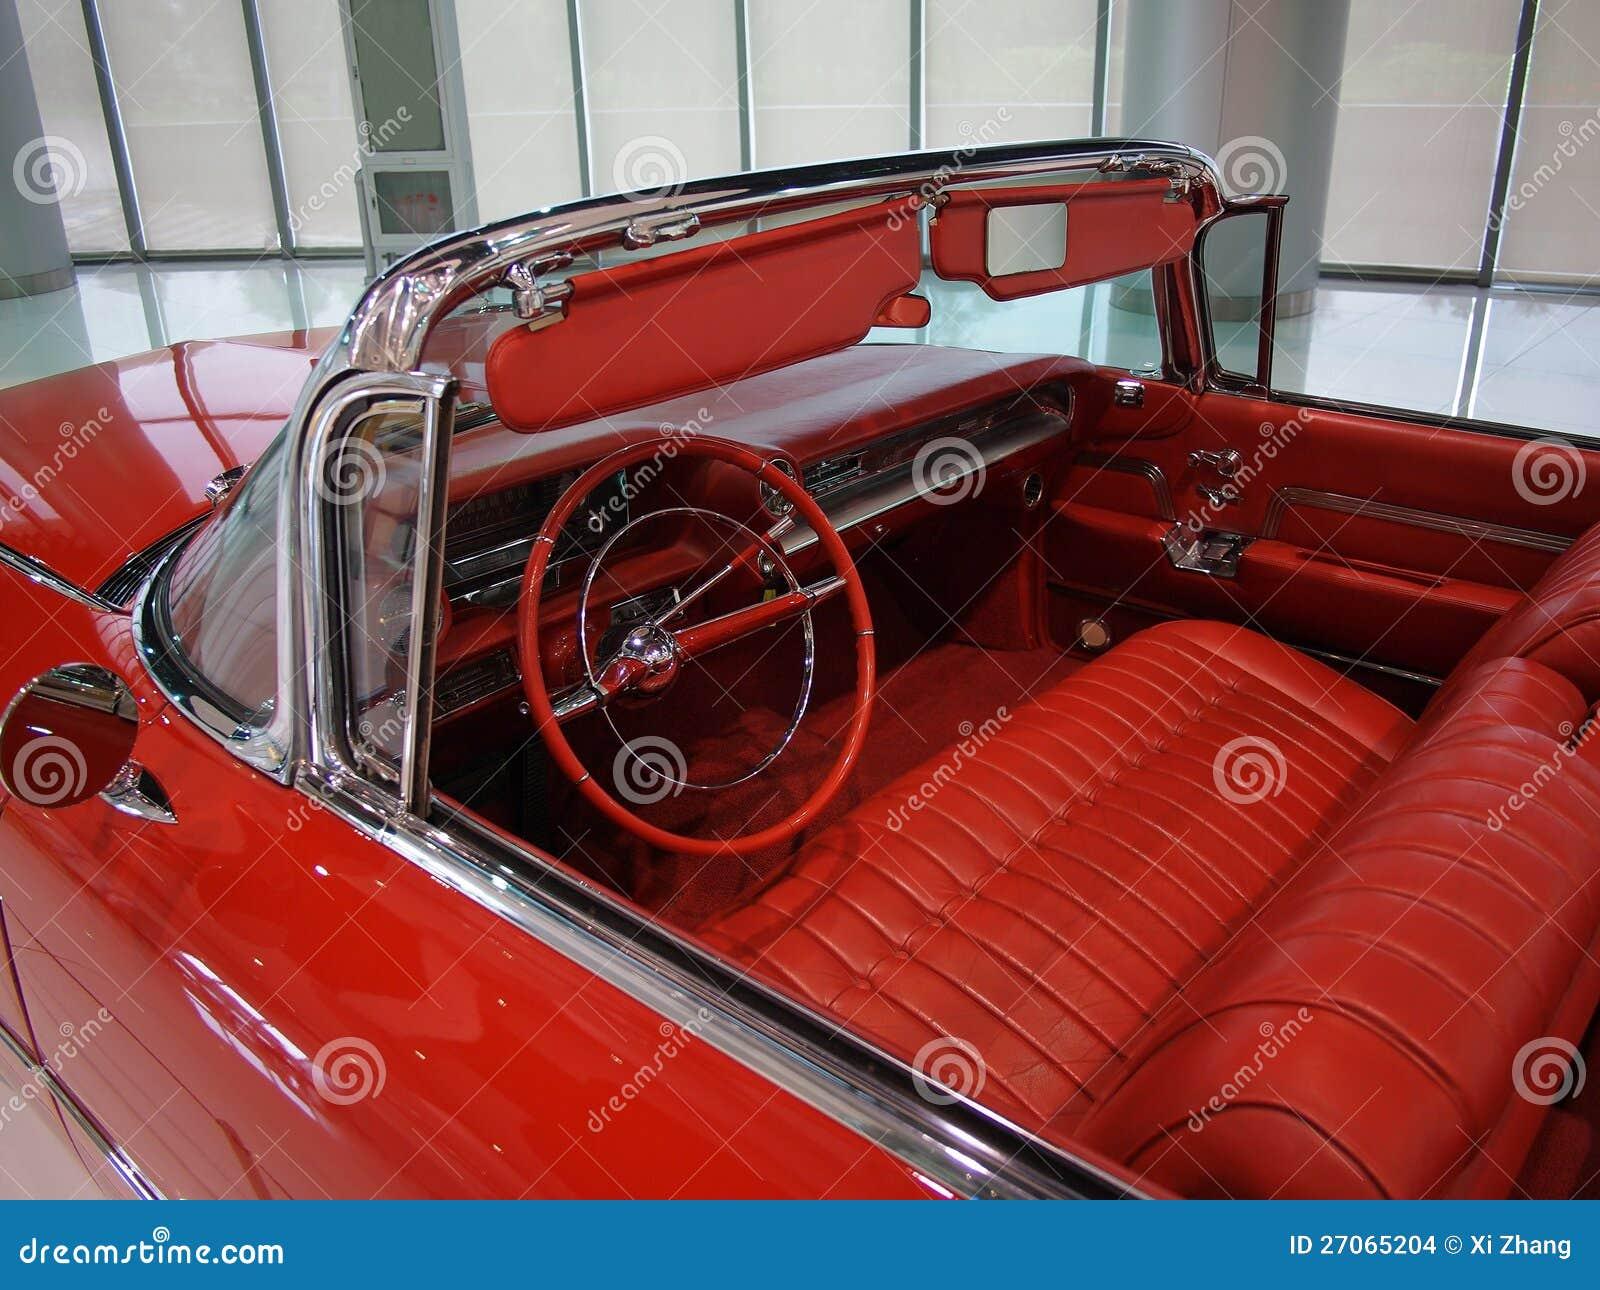 Cadillac auto innenraum stockbilder bild 27065204 for Auto innenraum